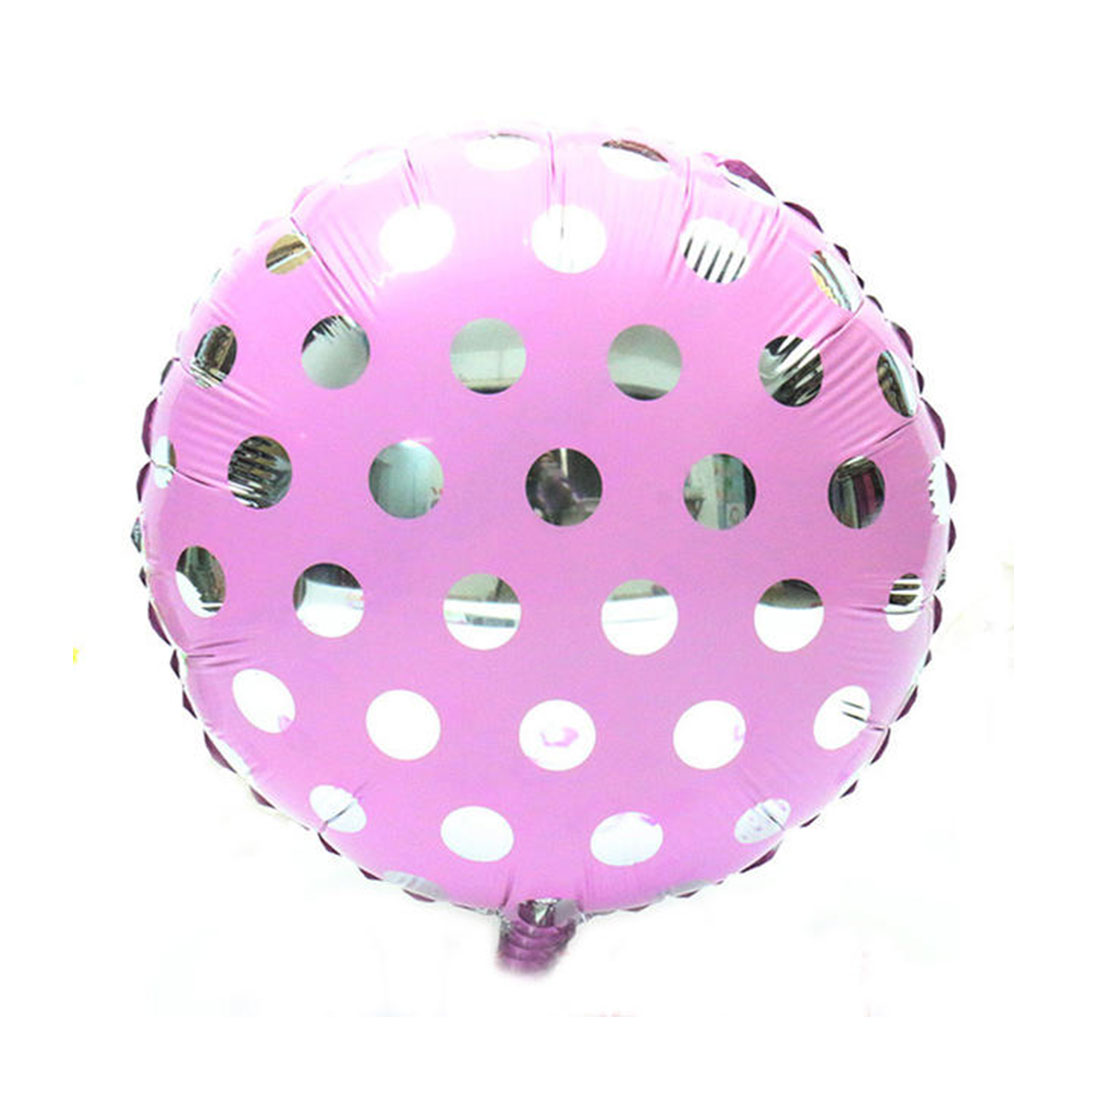 Foil Dot Printed Round Shaped Balloon Wedding Birthday Party Celebration Decor Light Purple 18 Inch